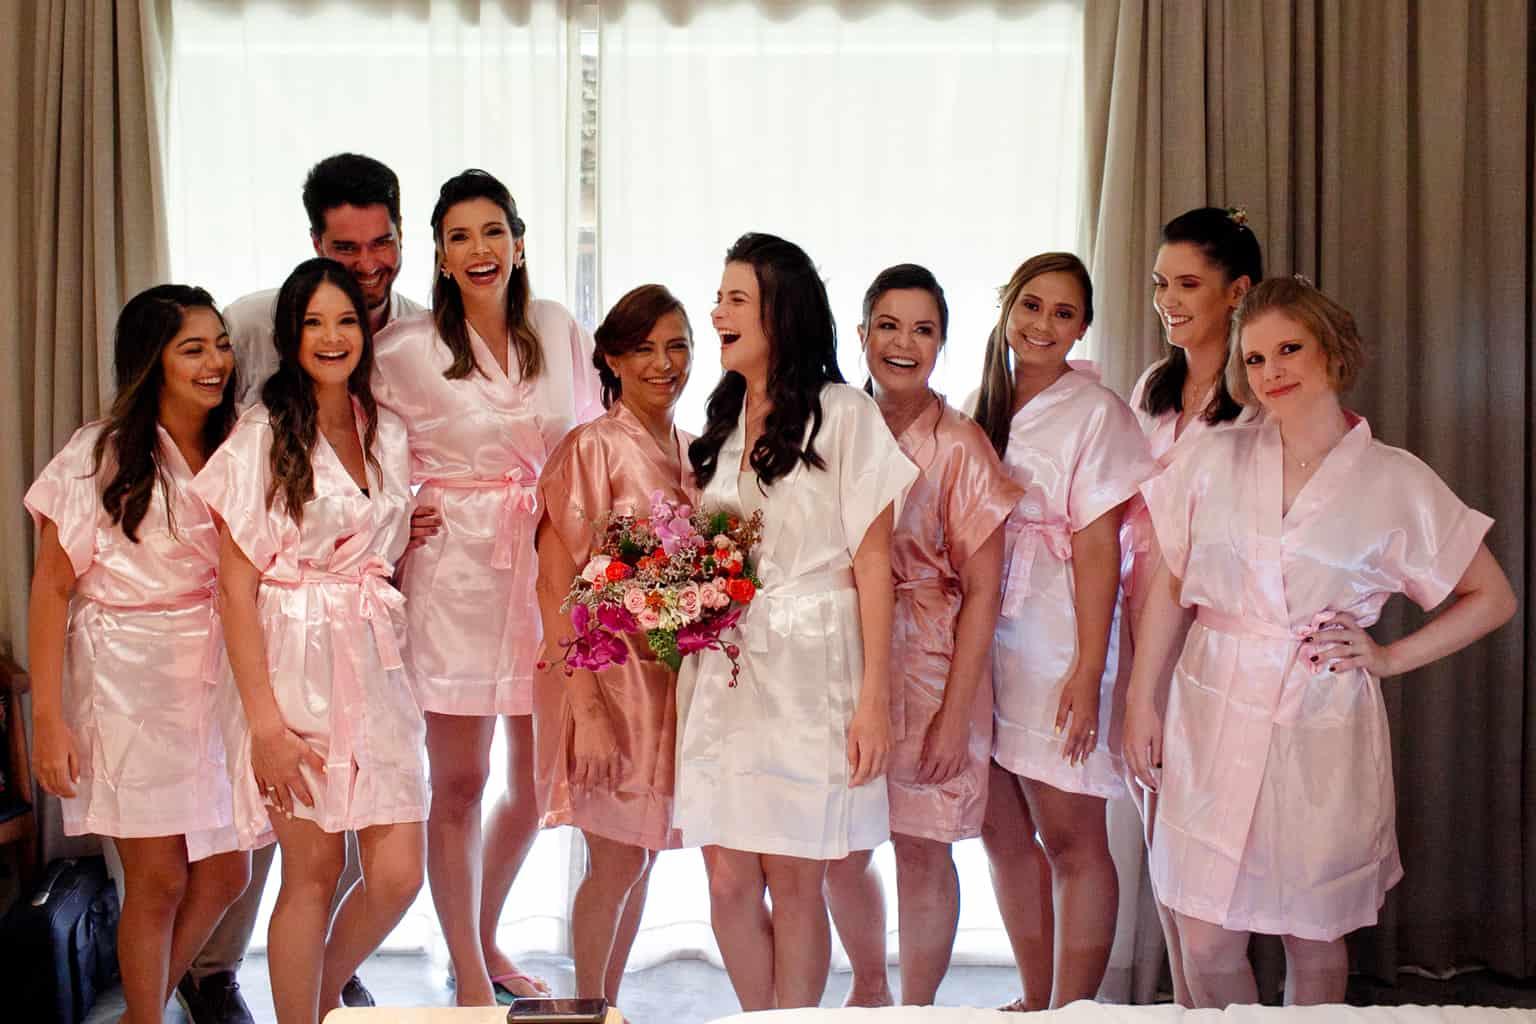 Casamento-Emanuelle-e-Alysson-Fotografia-Tadeu-Nanó-e-Luca-Antunes-394